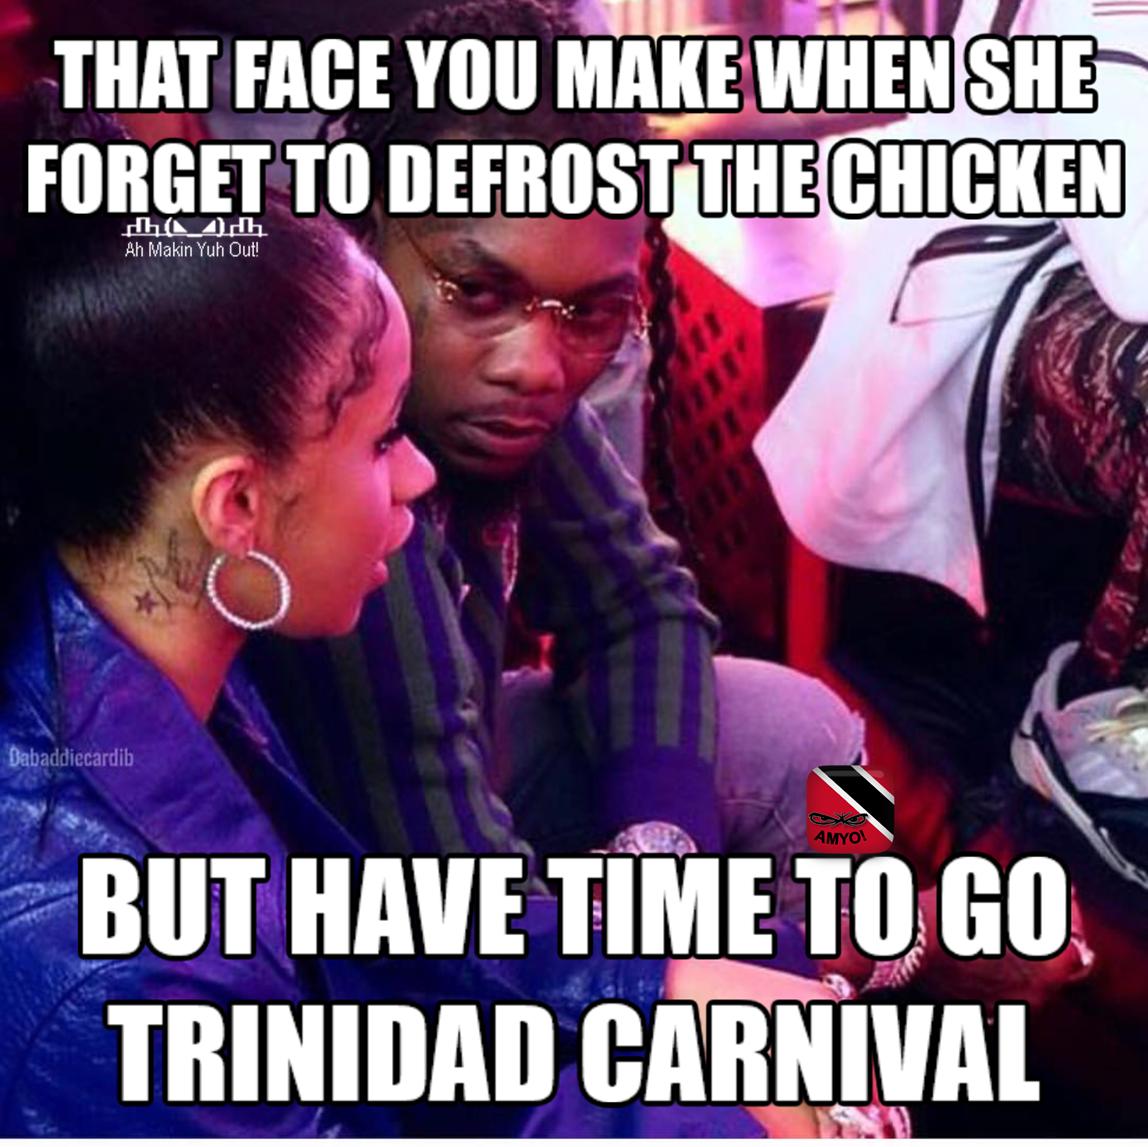 Cardib Offset Music Trinidad Meme Carnival2018 Trinidadandtobago Trinidadcarnival2018 Lookting Yuhonshit Everything Funny Trinidad Carnival It Hurts